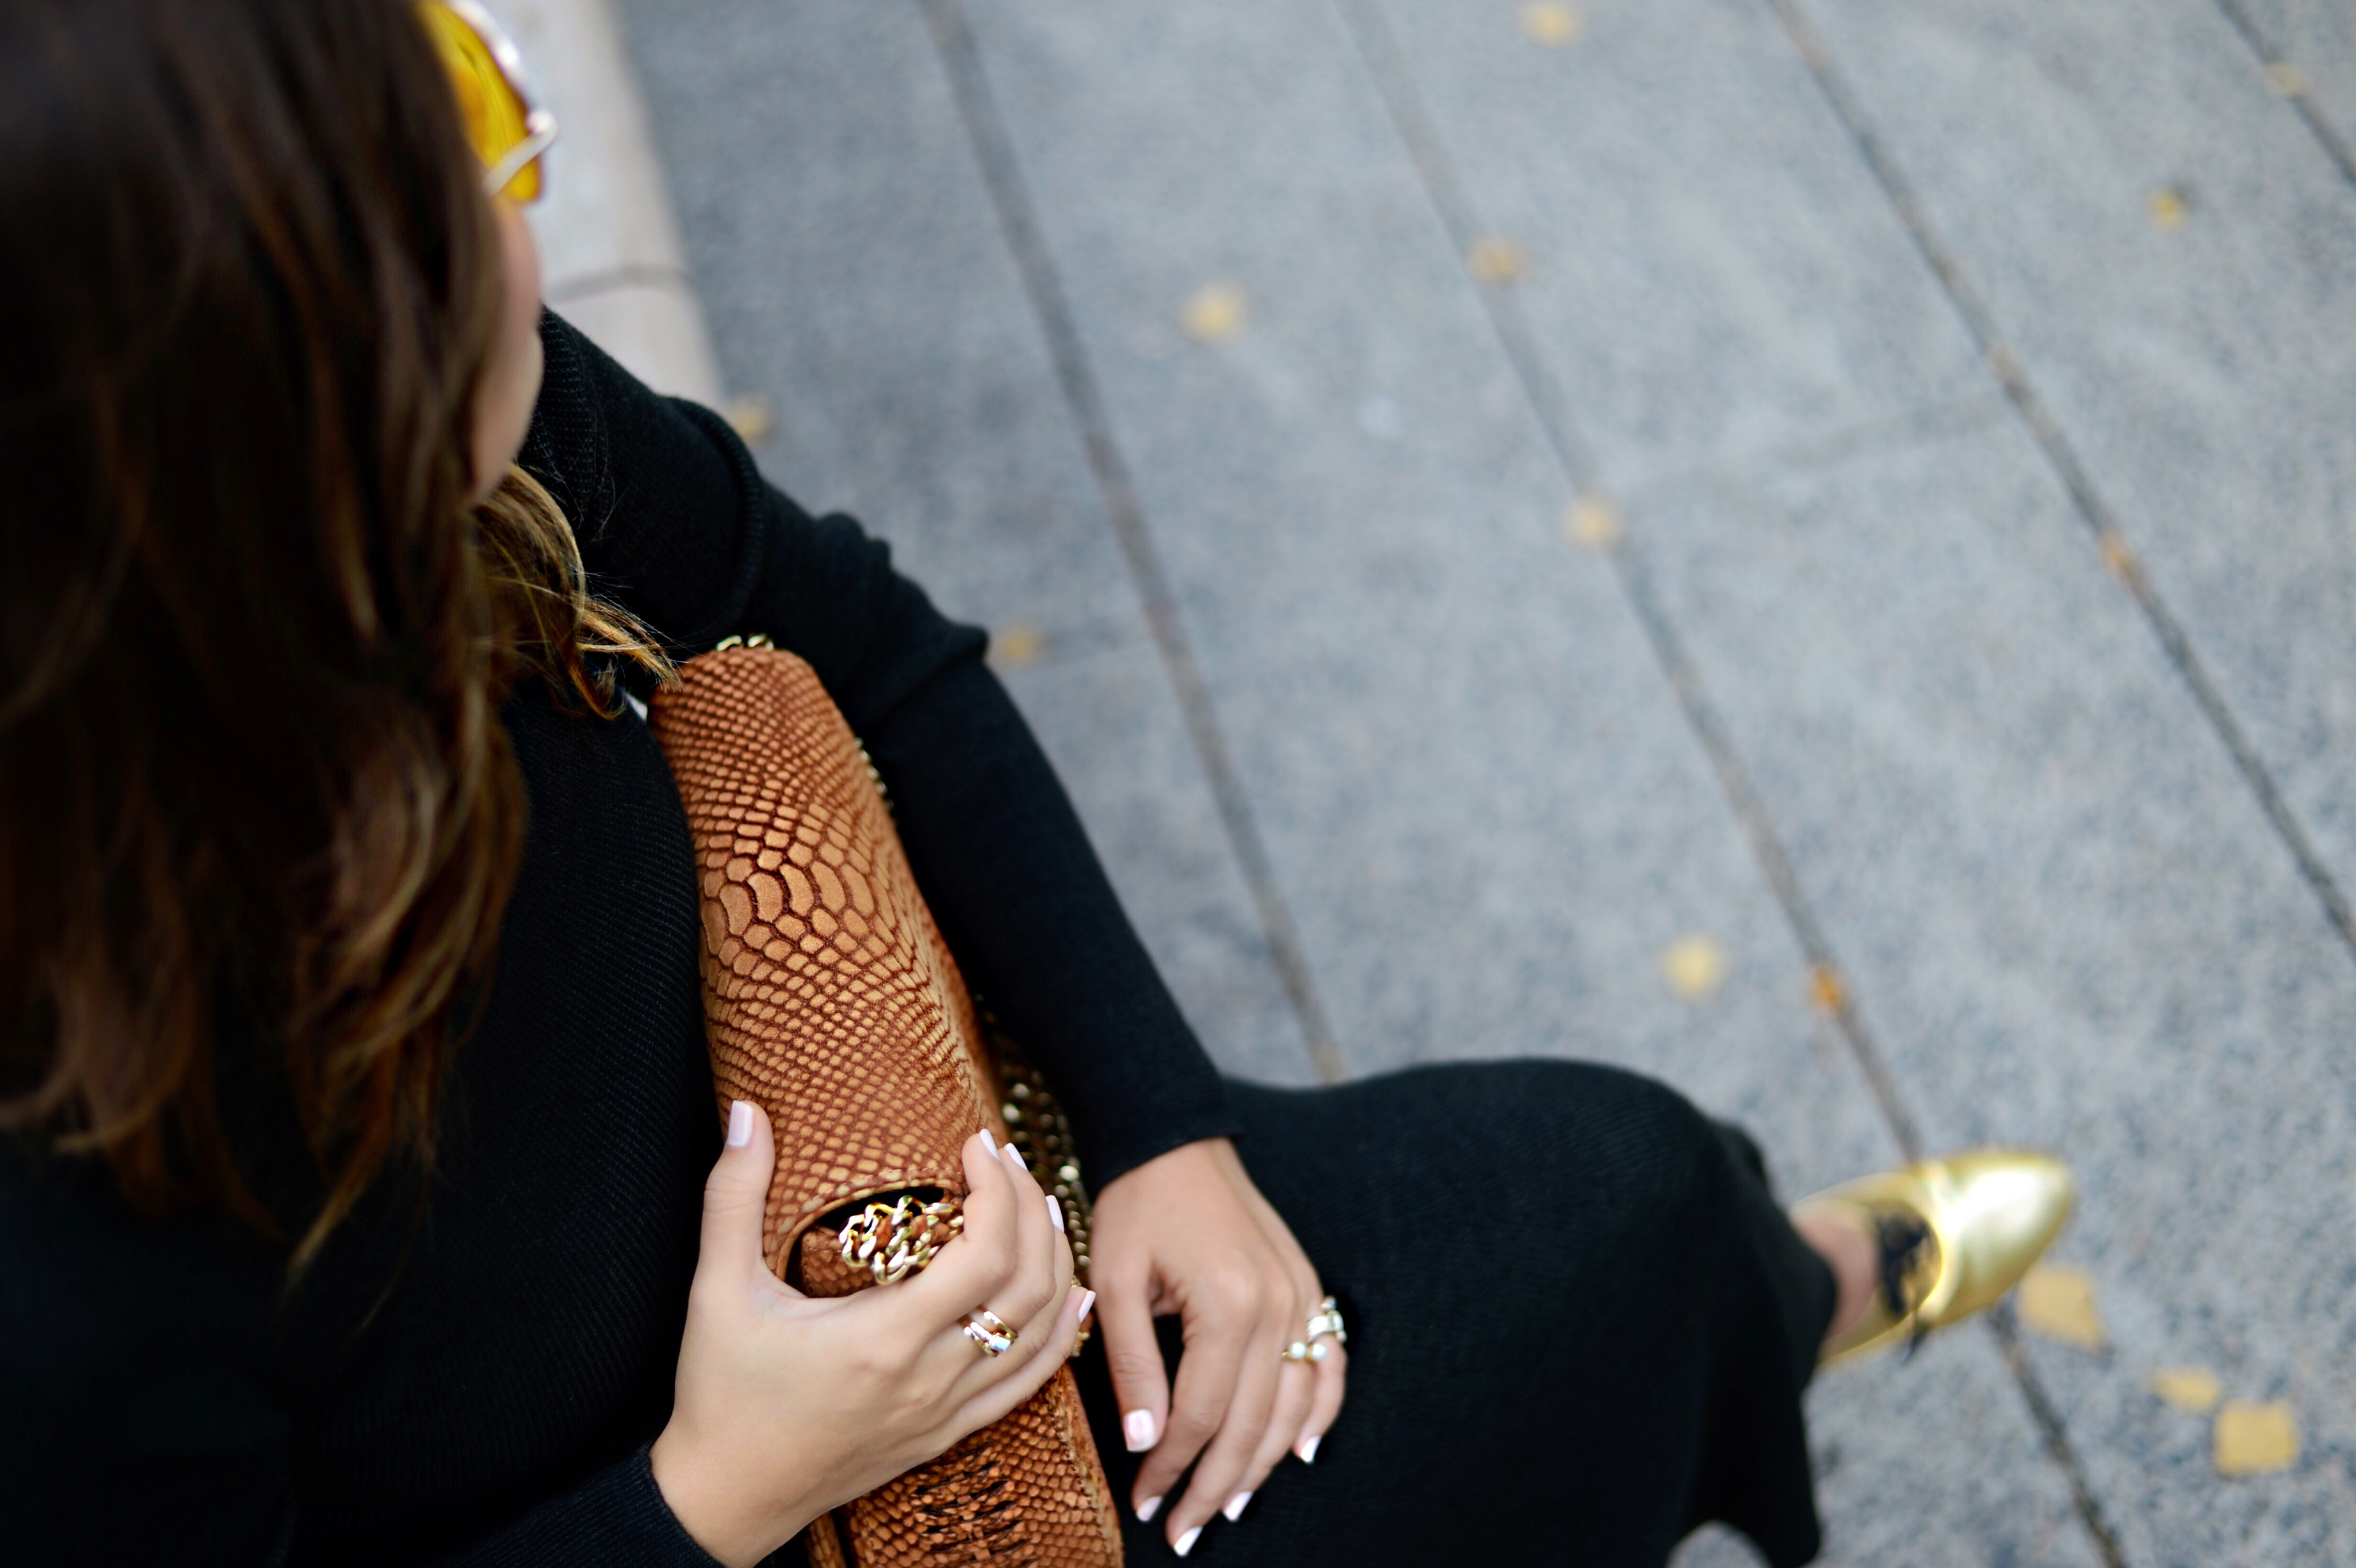 jersey-dress-gold-shoes-alley-girl-betul-yildiz-new-york-fashion-blogger-8